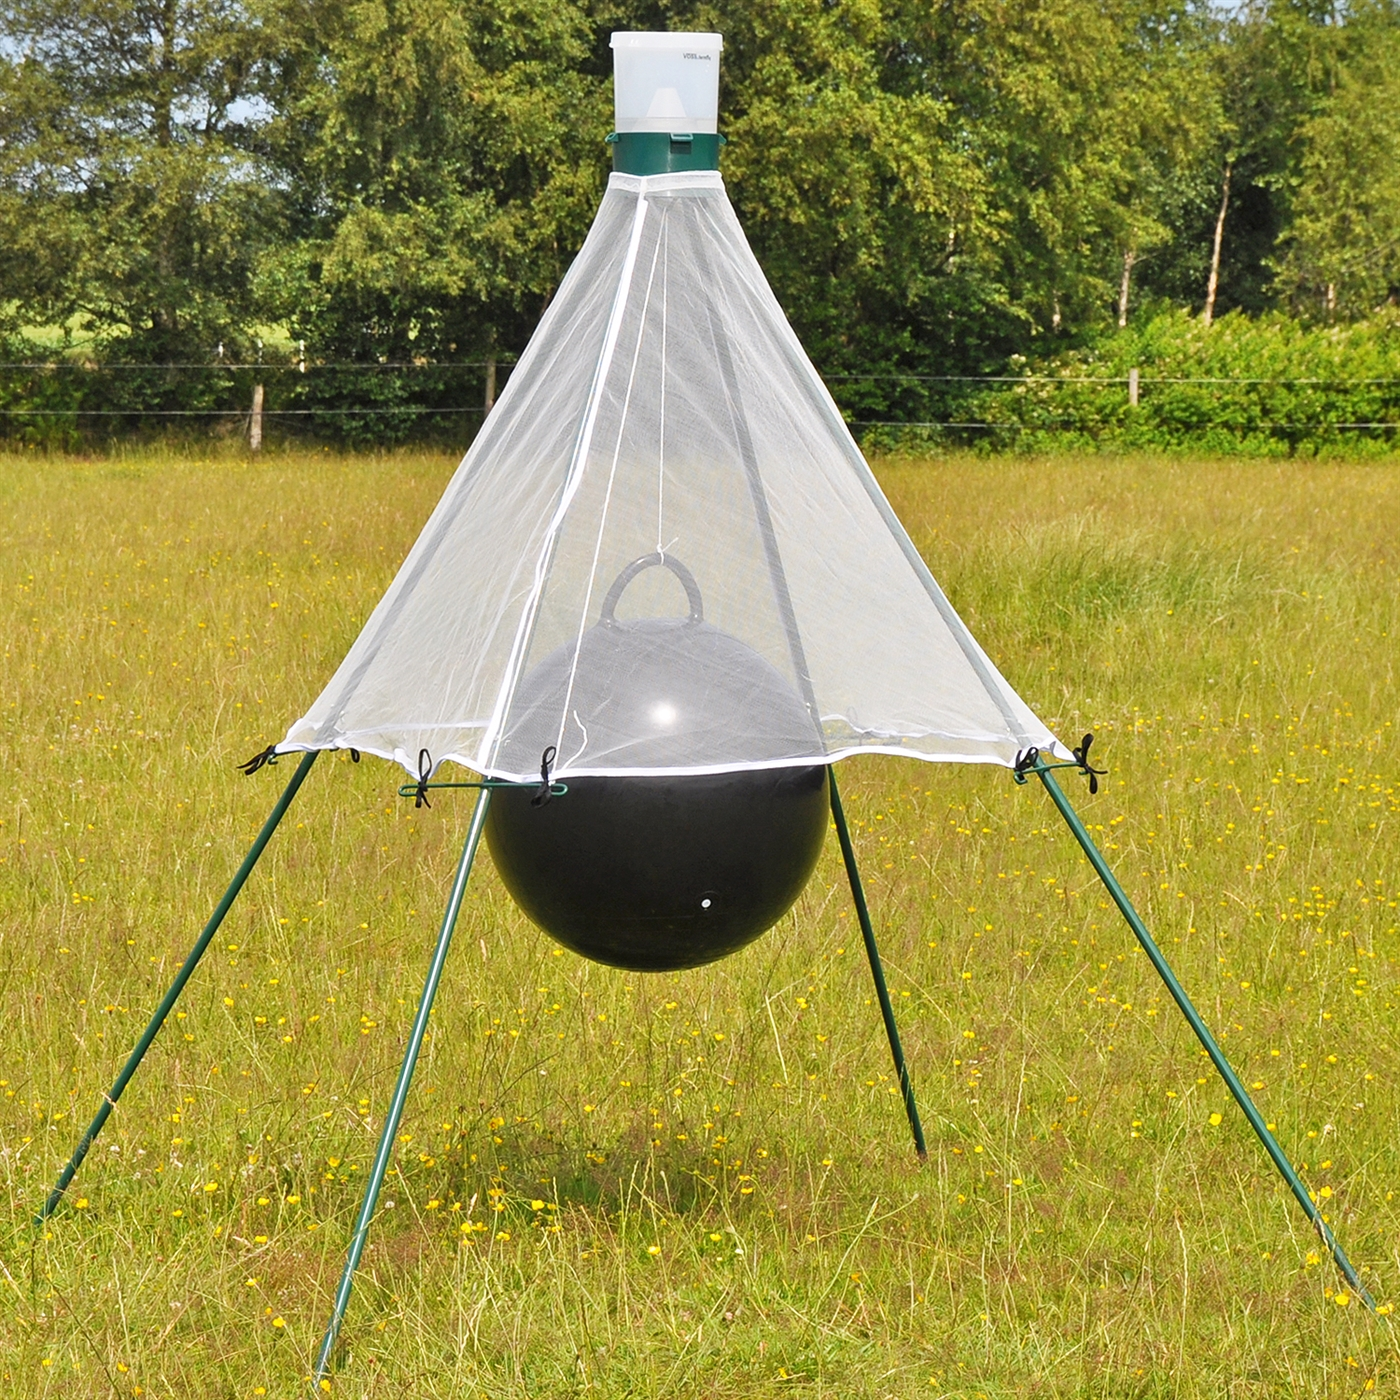 delta trap mobile bremsenfalle insektenfalle pferde fliegenfalle ebay. Black Bedroom Furniture Sets. Home Design Ideas